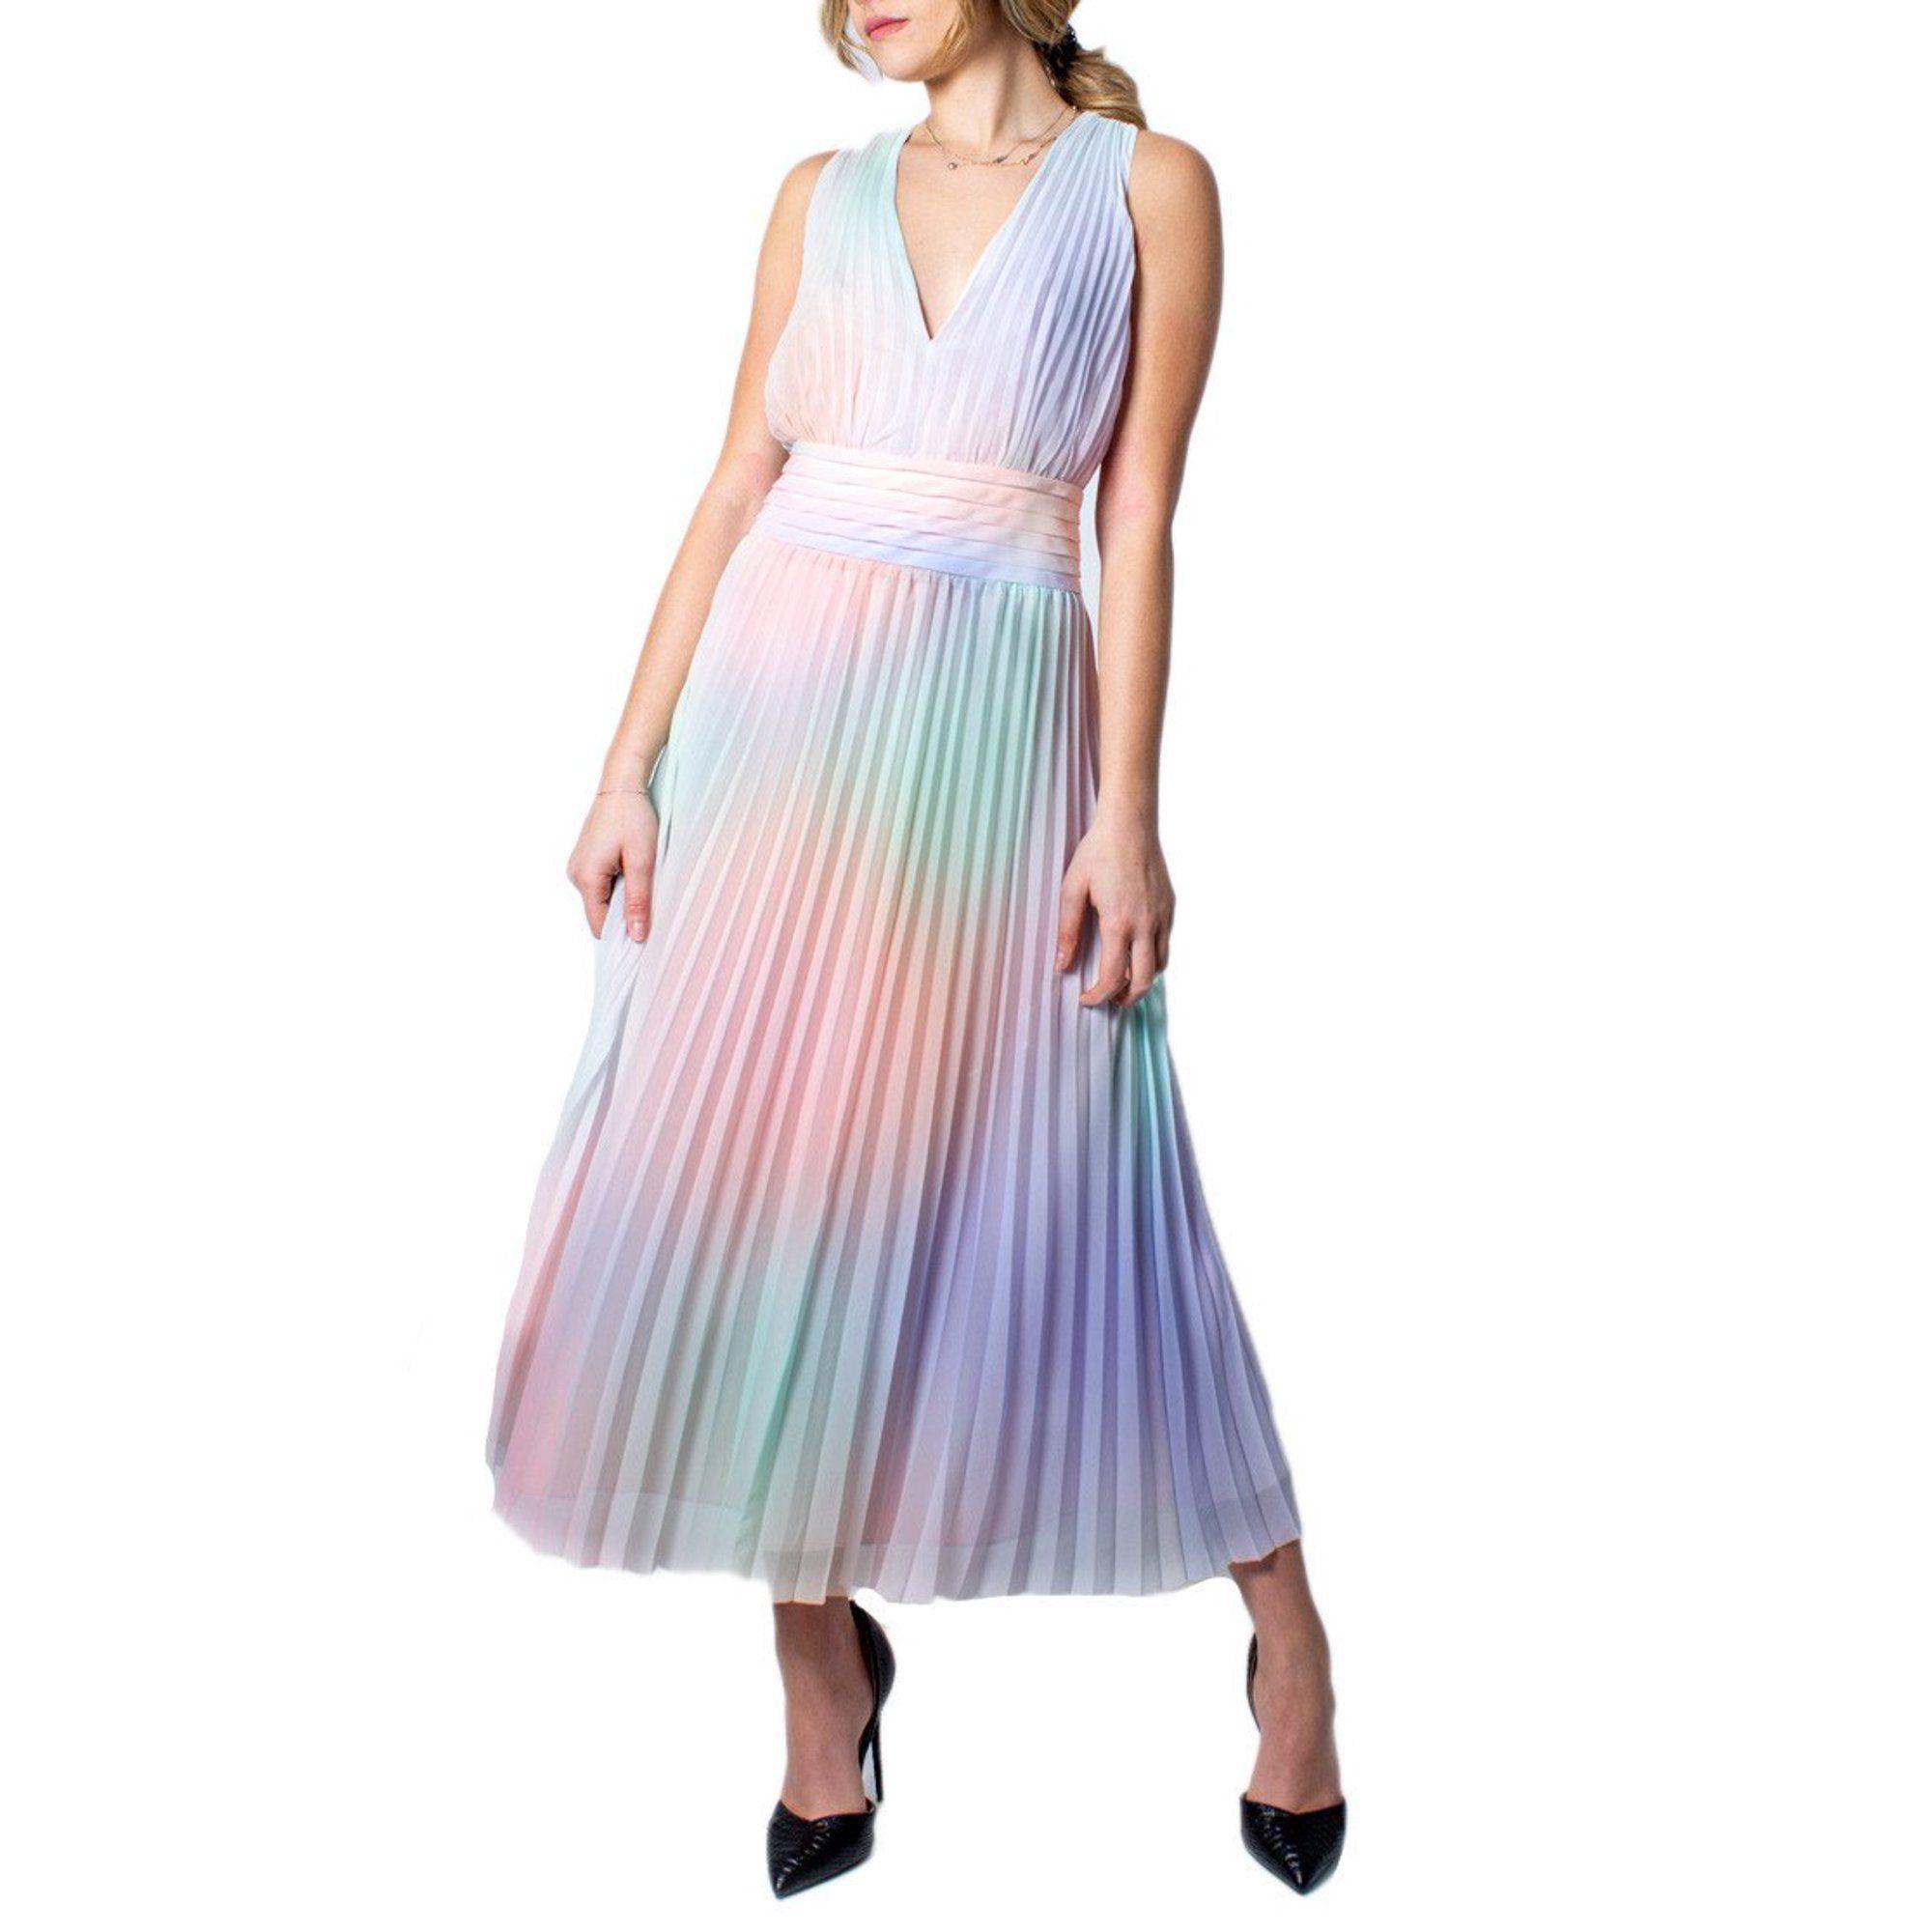 Guess Guess Women S Multicolor Dress Walmart Com Womens Dresses Dresses Womens Cocktail Dresses [ 2000 x 2000 Pixel ]